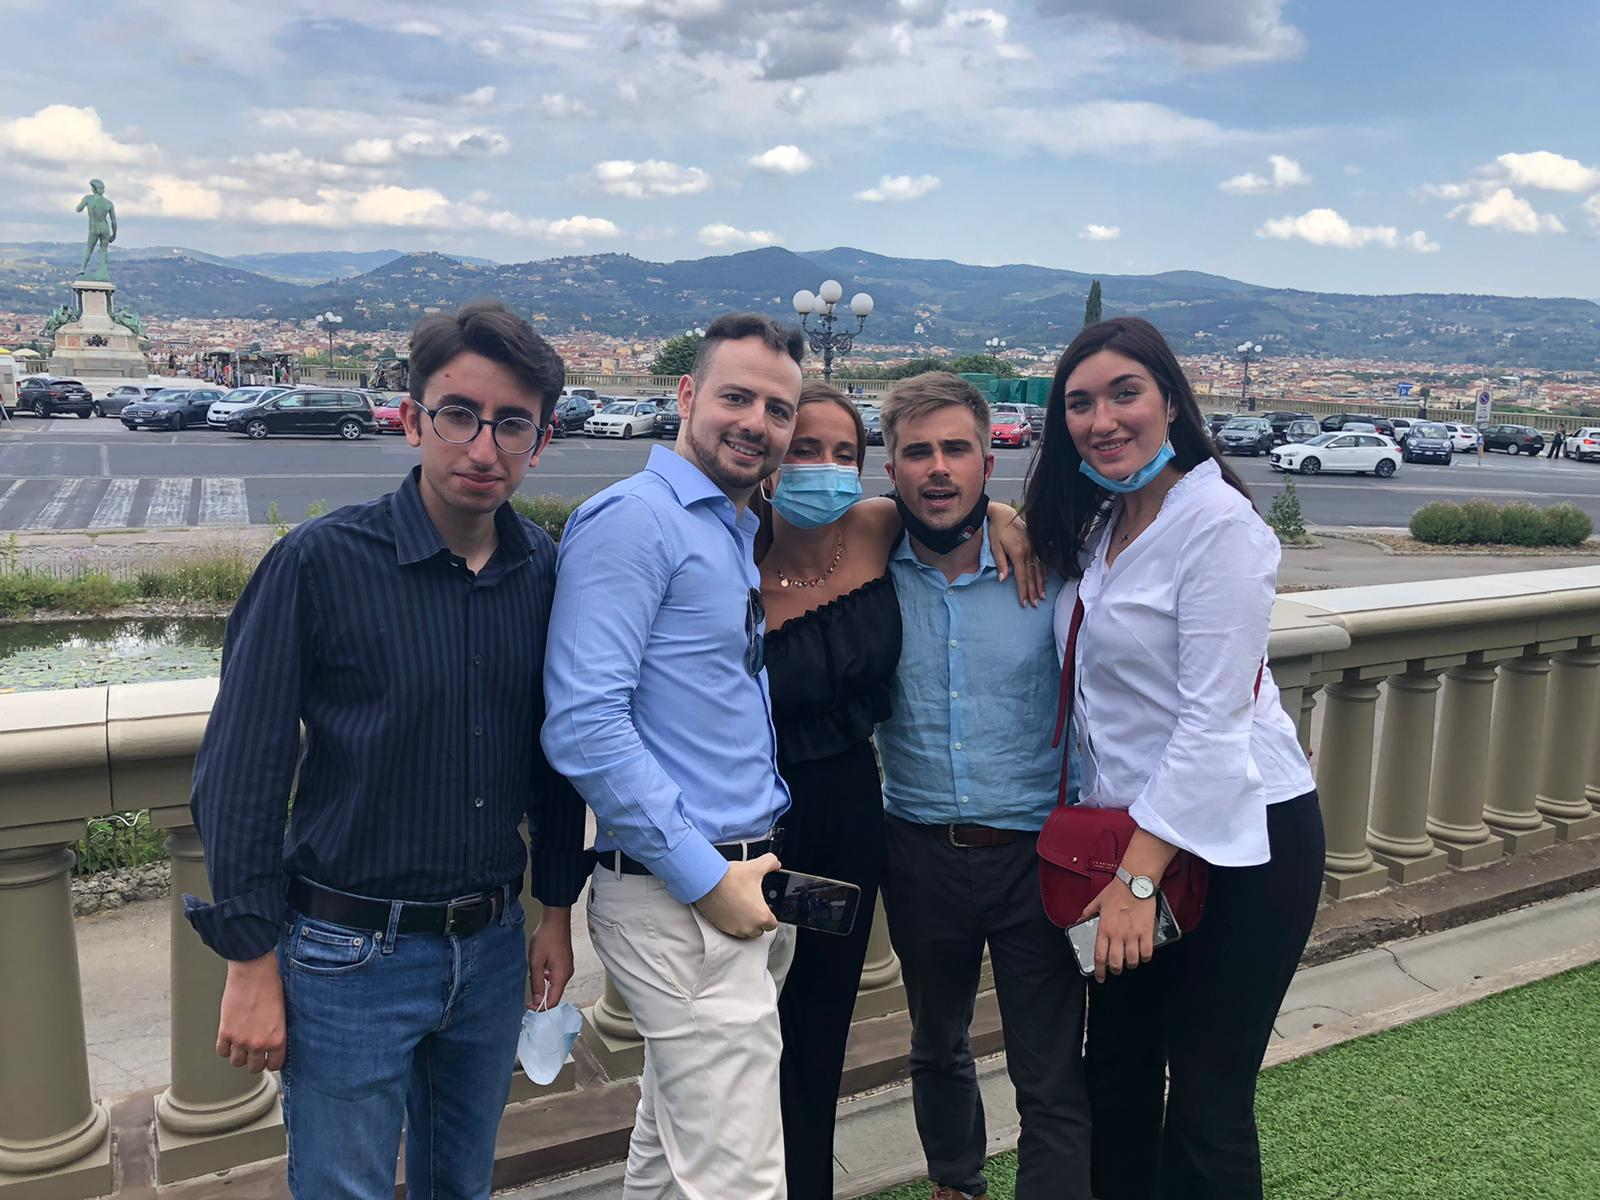 Coordinamento regionale a porte aperte a Firenze 26